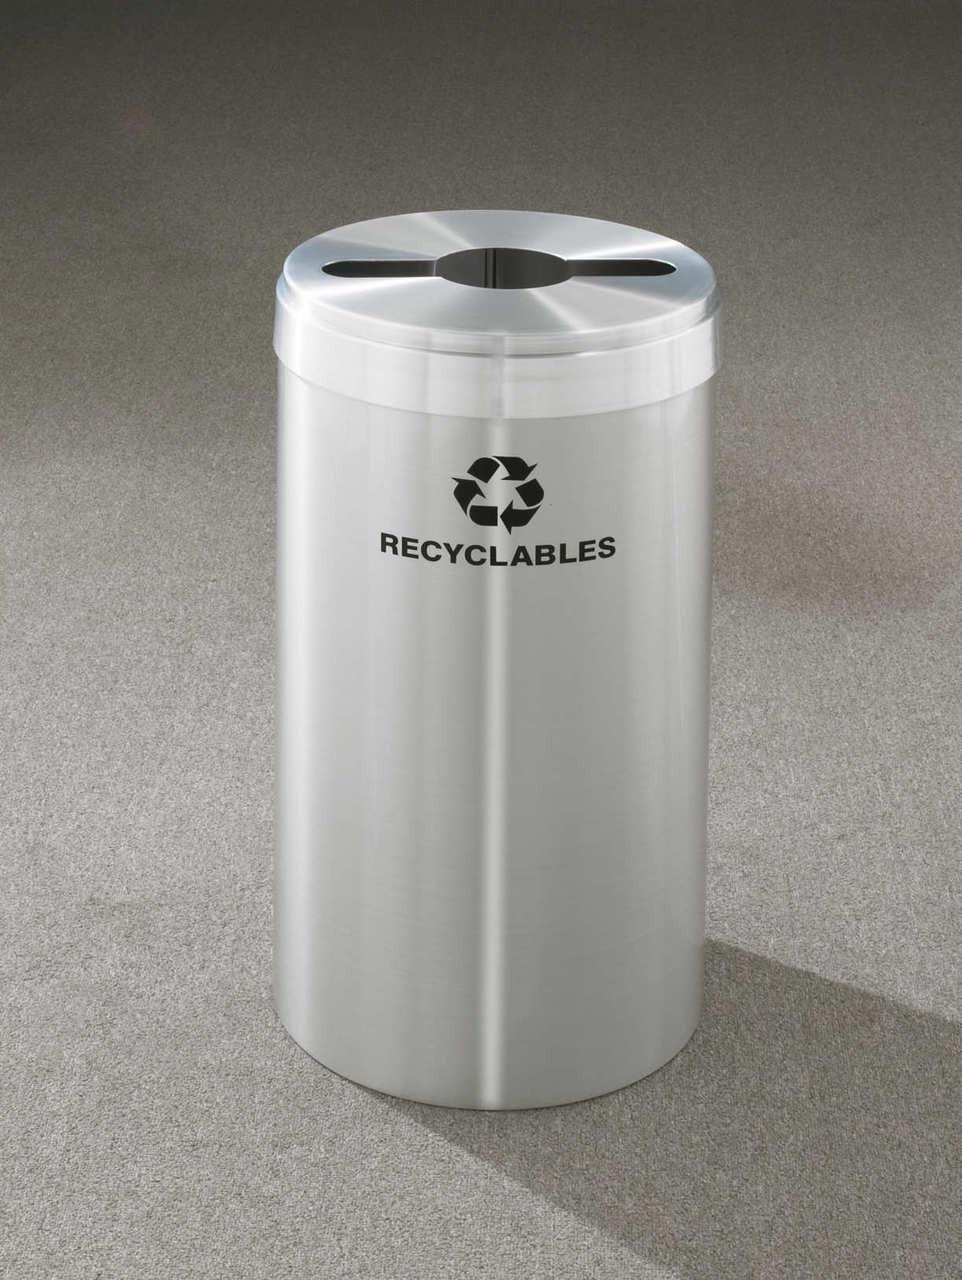 16 Gallon Metal Recycling Trash Can